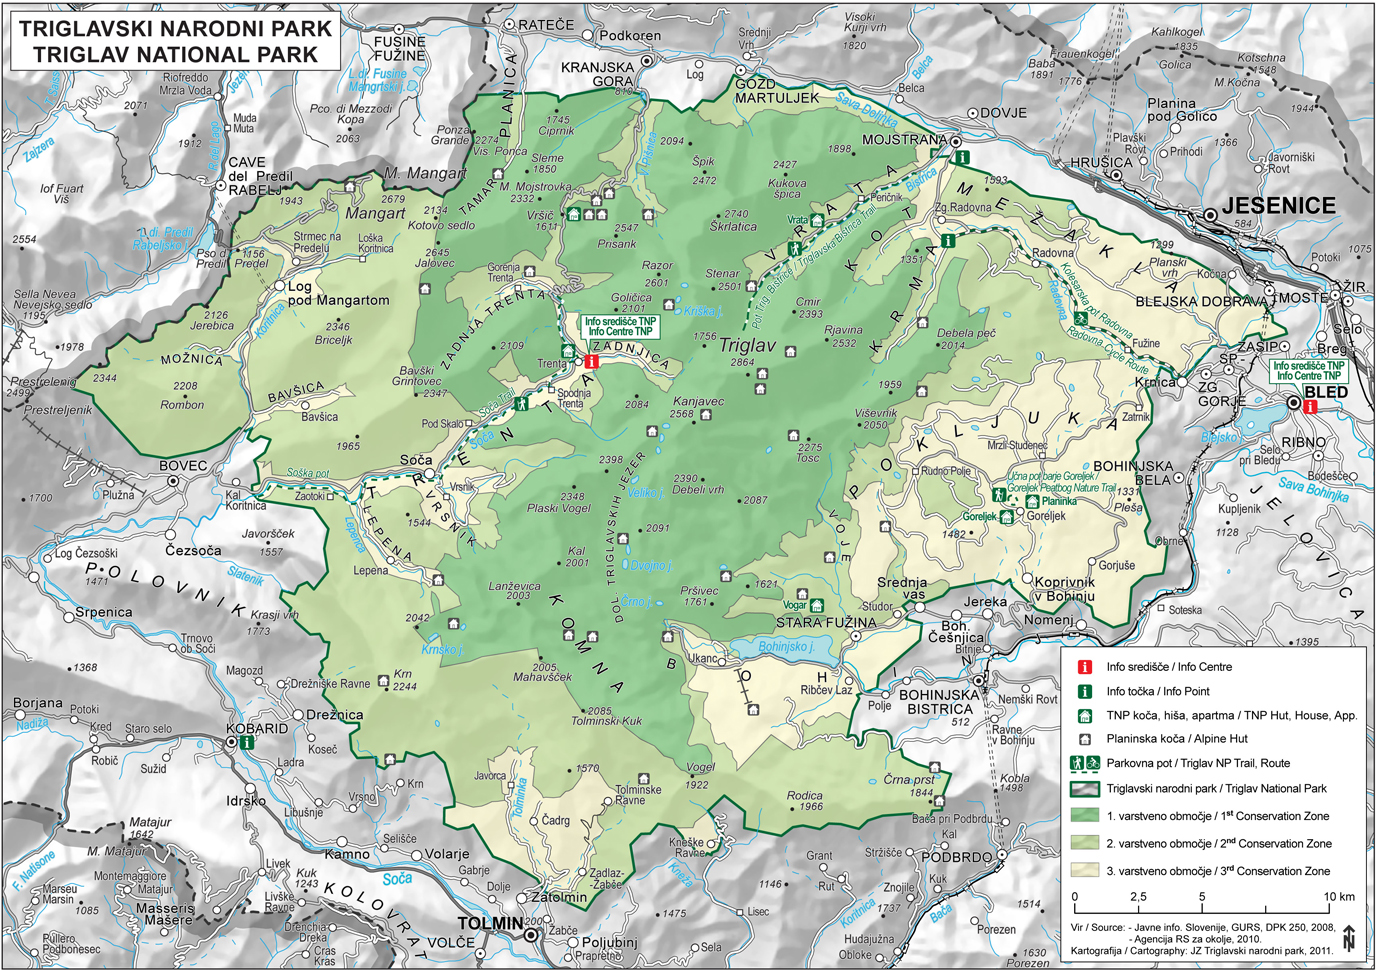 Mapa de Triglav